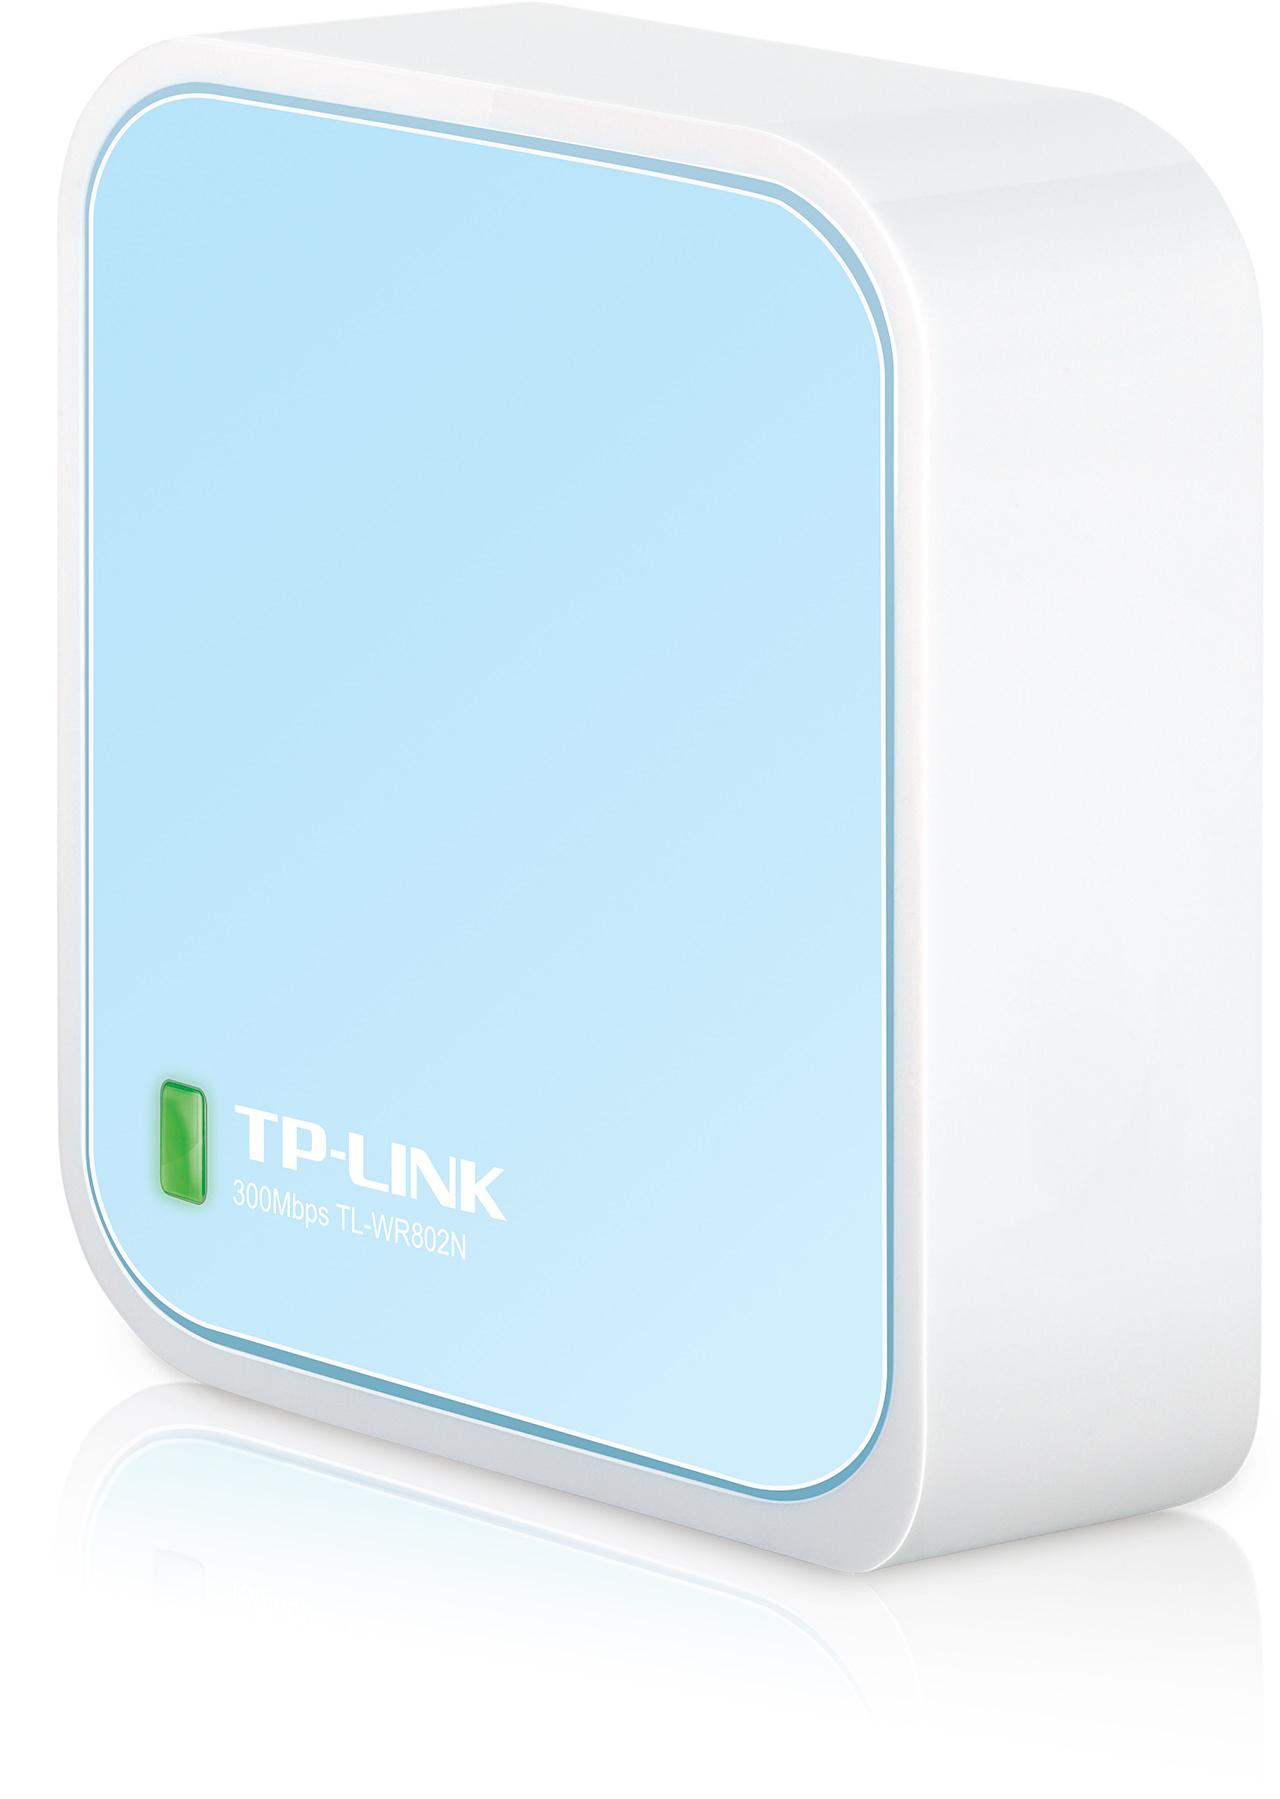 TP-Link TL-WR802N [Bezdrátový router Wireless Nano N 300 Mbit/s]